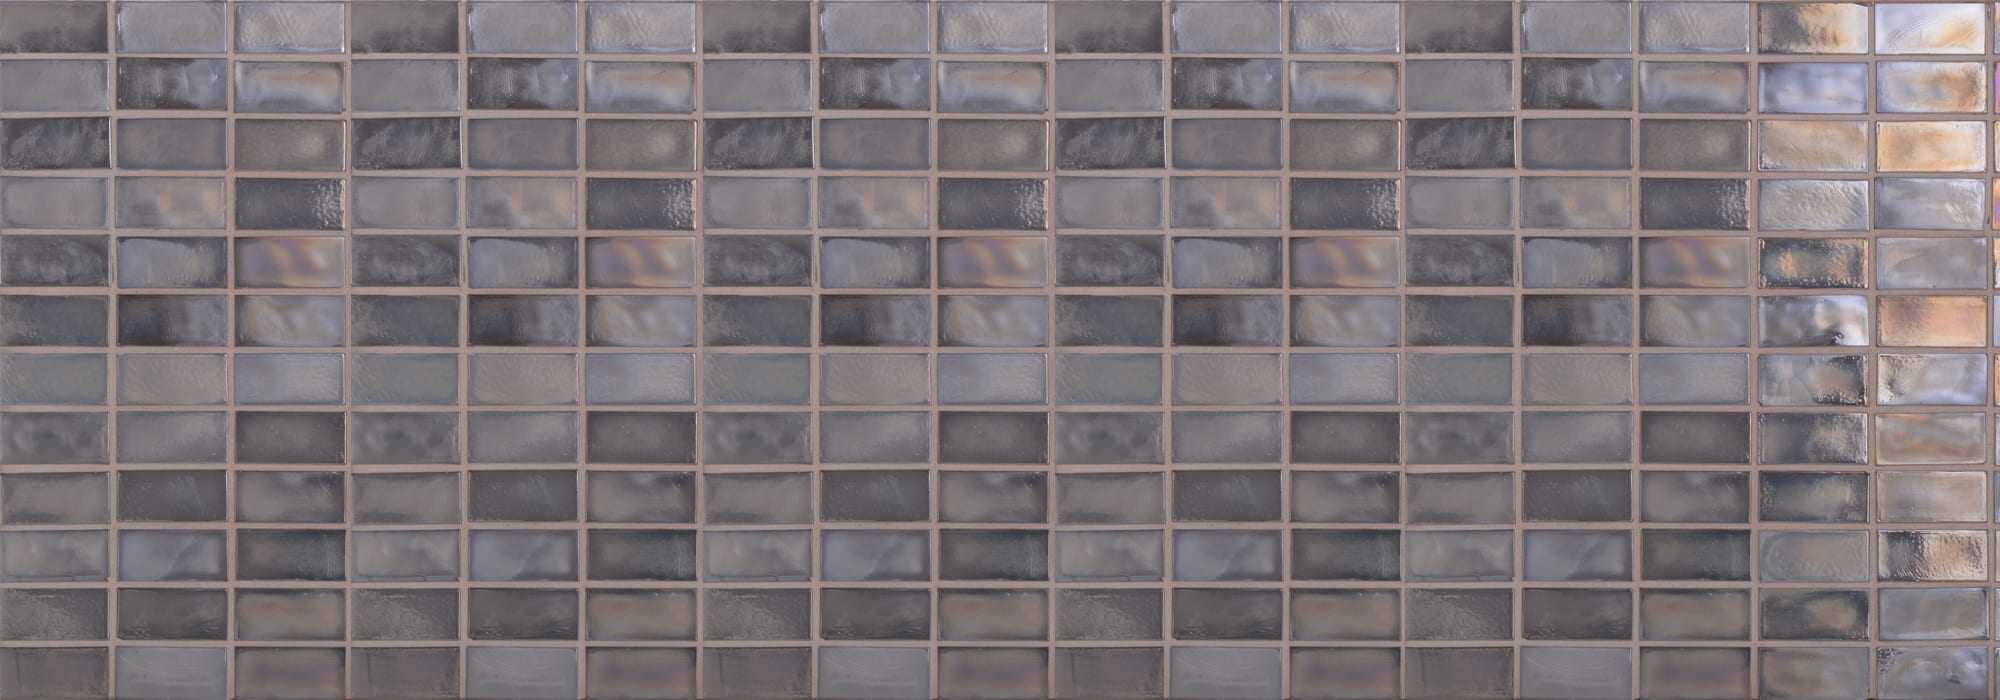 פסיפס זכוכית האגריד by Milstone